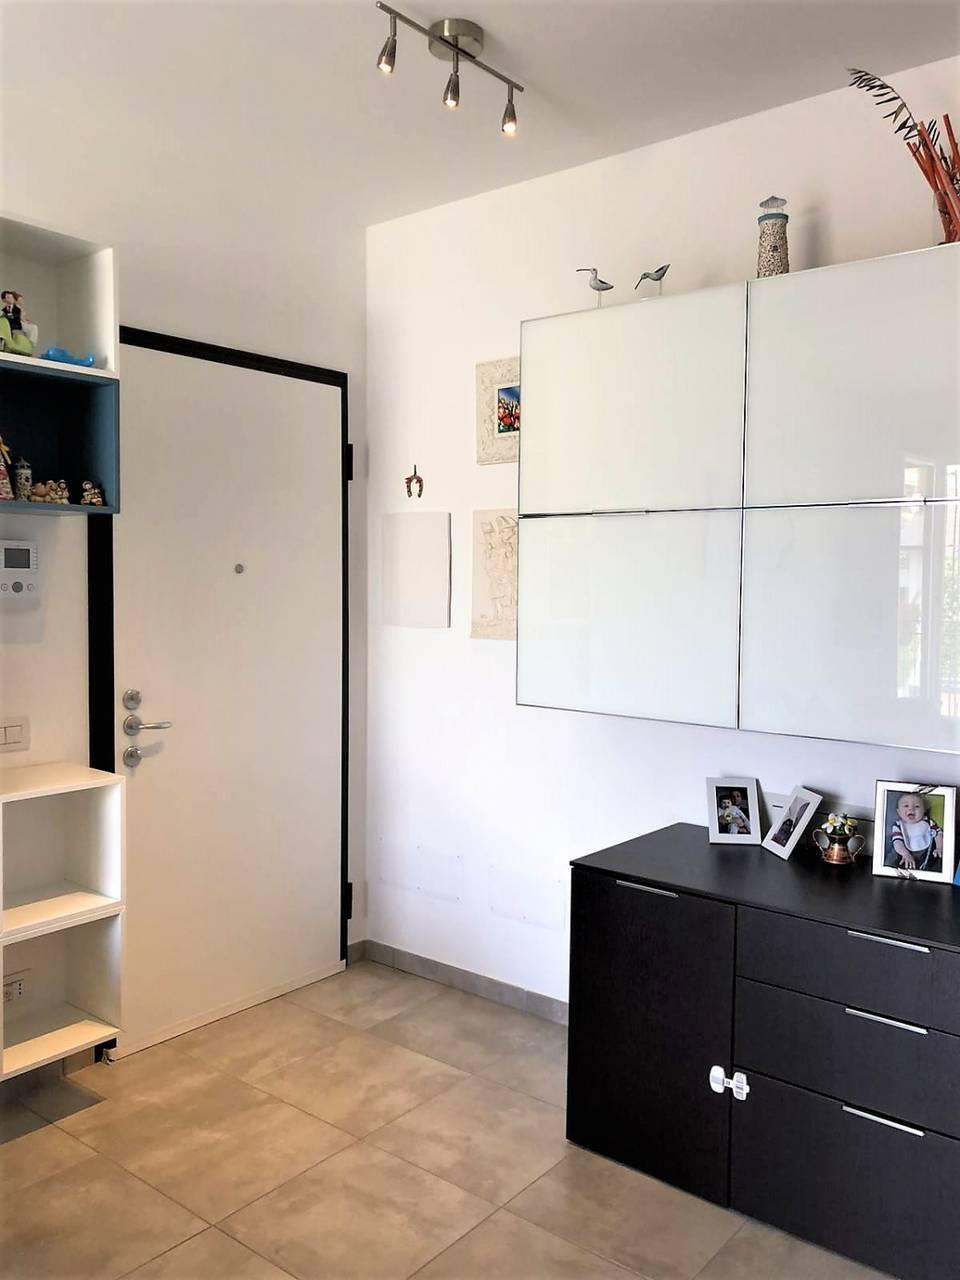 Appartamento-in-vendita-a-Busnago-in-Brianza-6